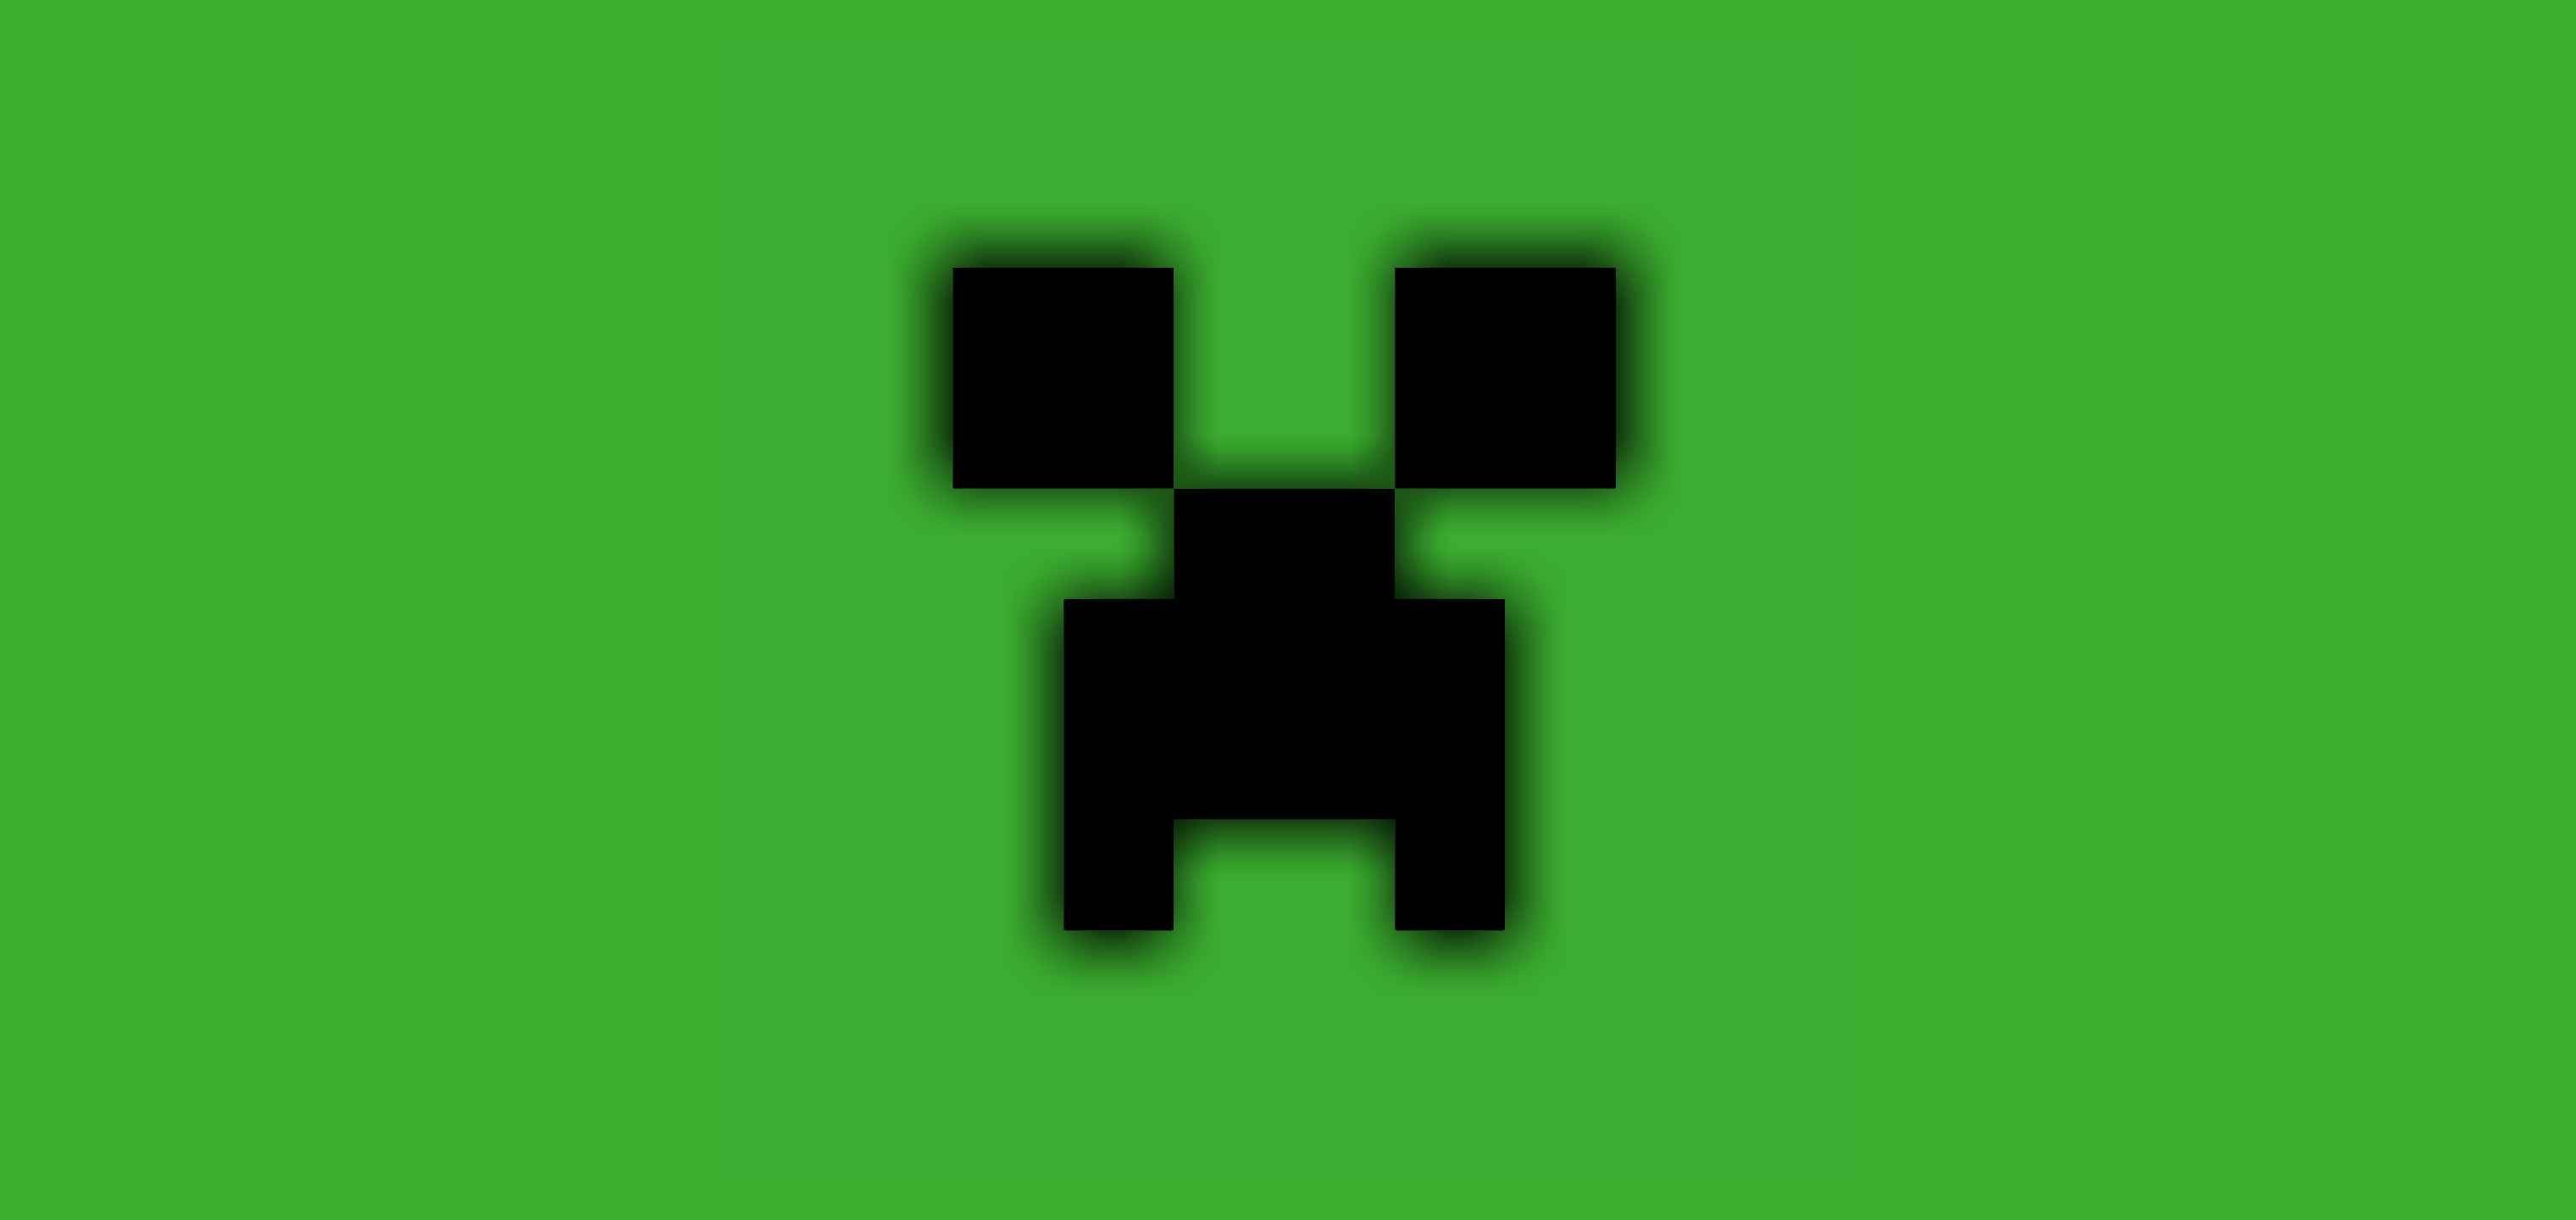 Minecraft Creeper Green Background HD